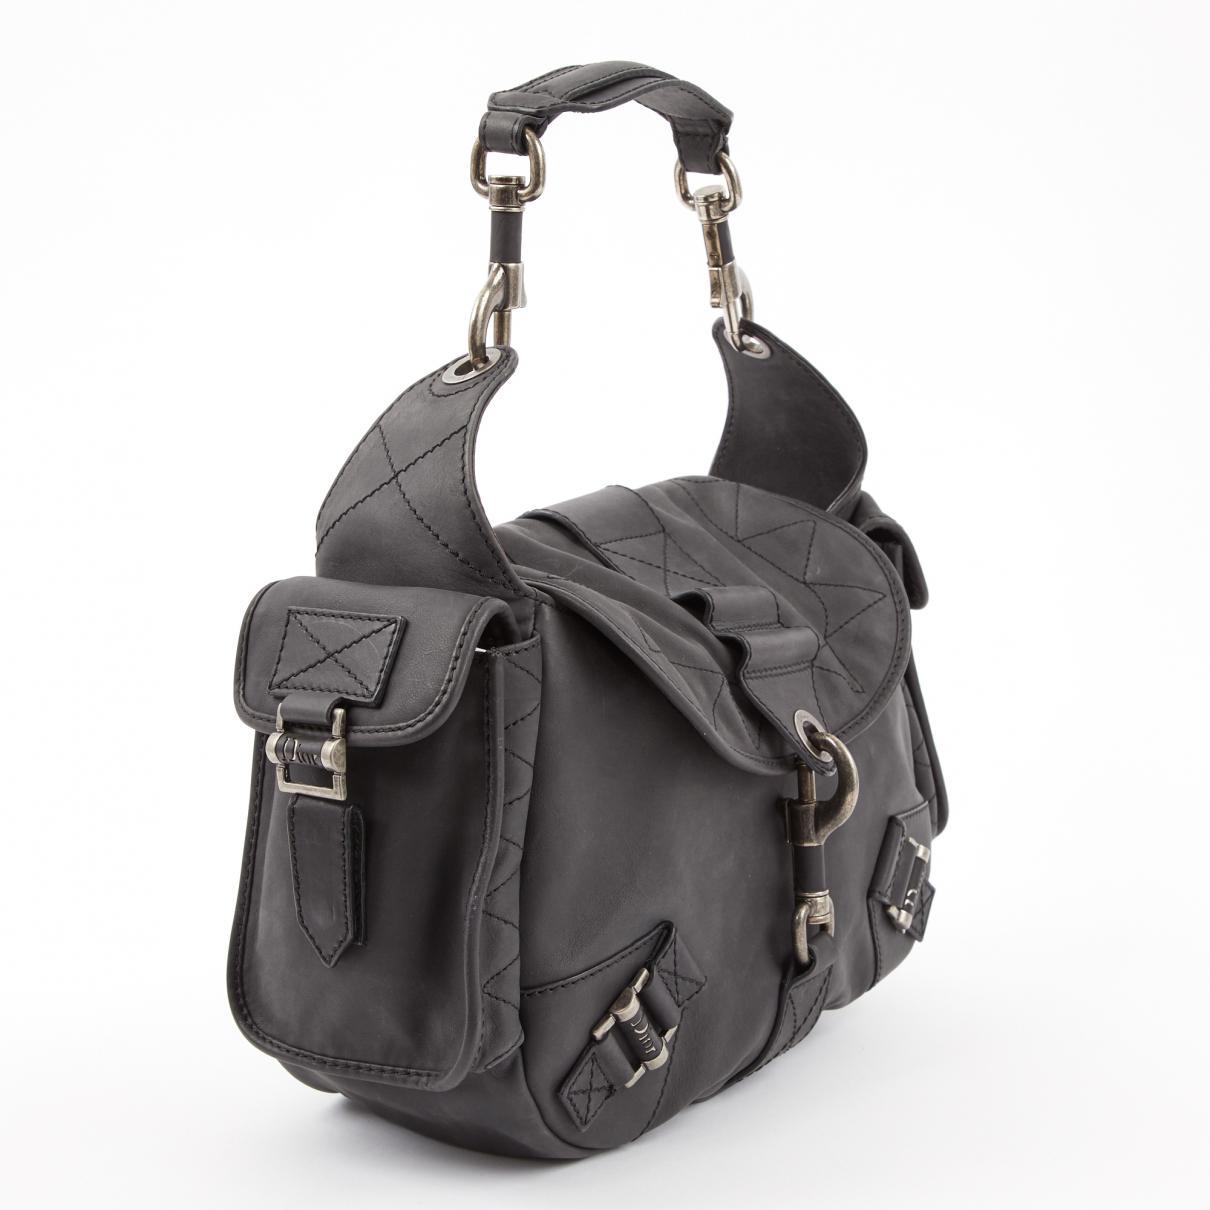 6c56beb2bdc Dior Pre-owned Vintage Grey Leather Handbags in Gray - Lyst